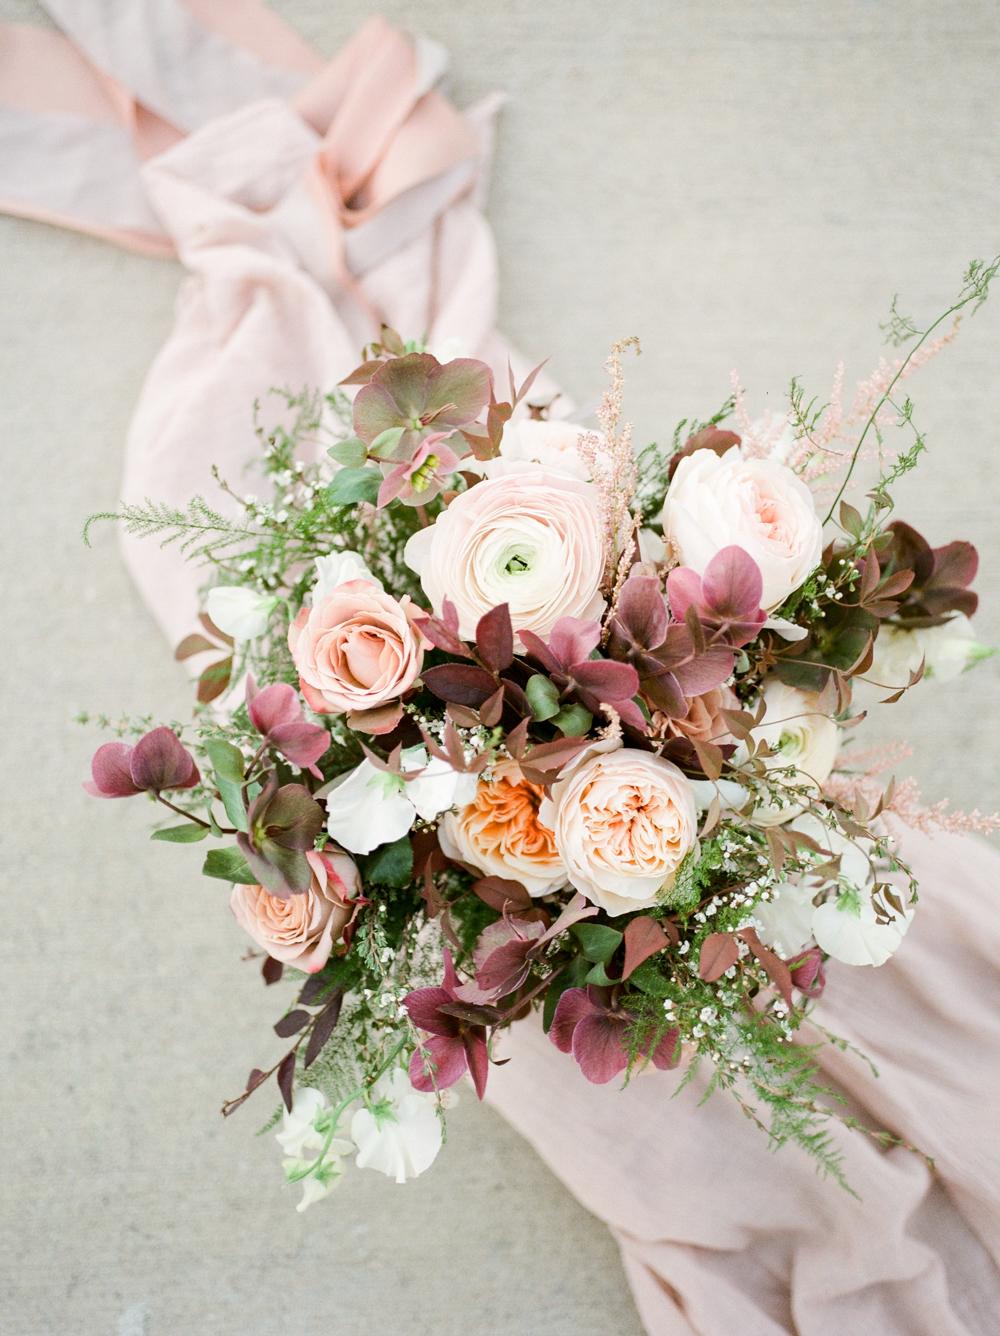 A lovely houston bride_wedding_Christine Gosch_www.christinegosch.com_Houston, TX-4.jpg